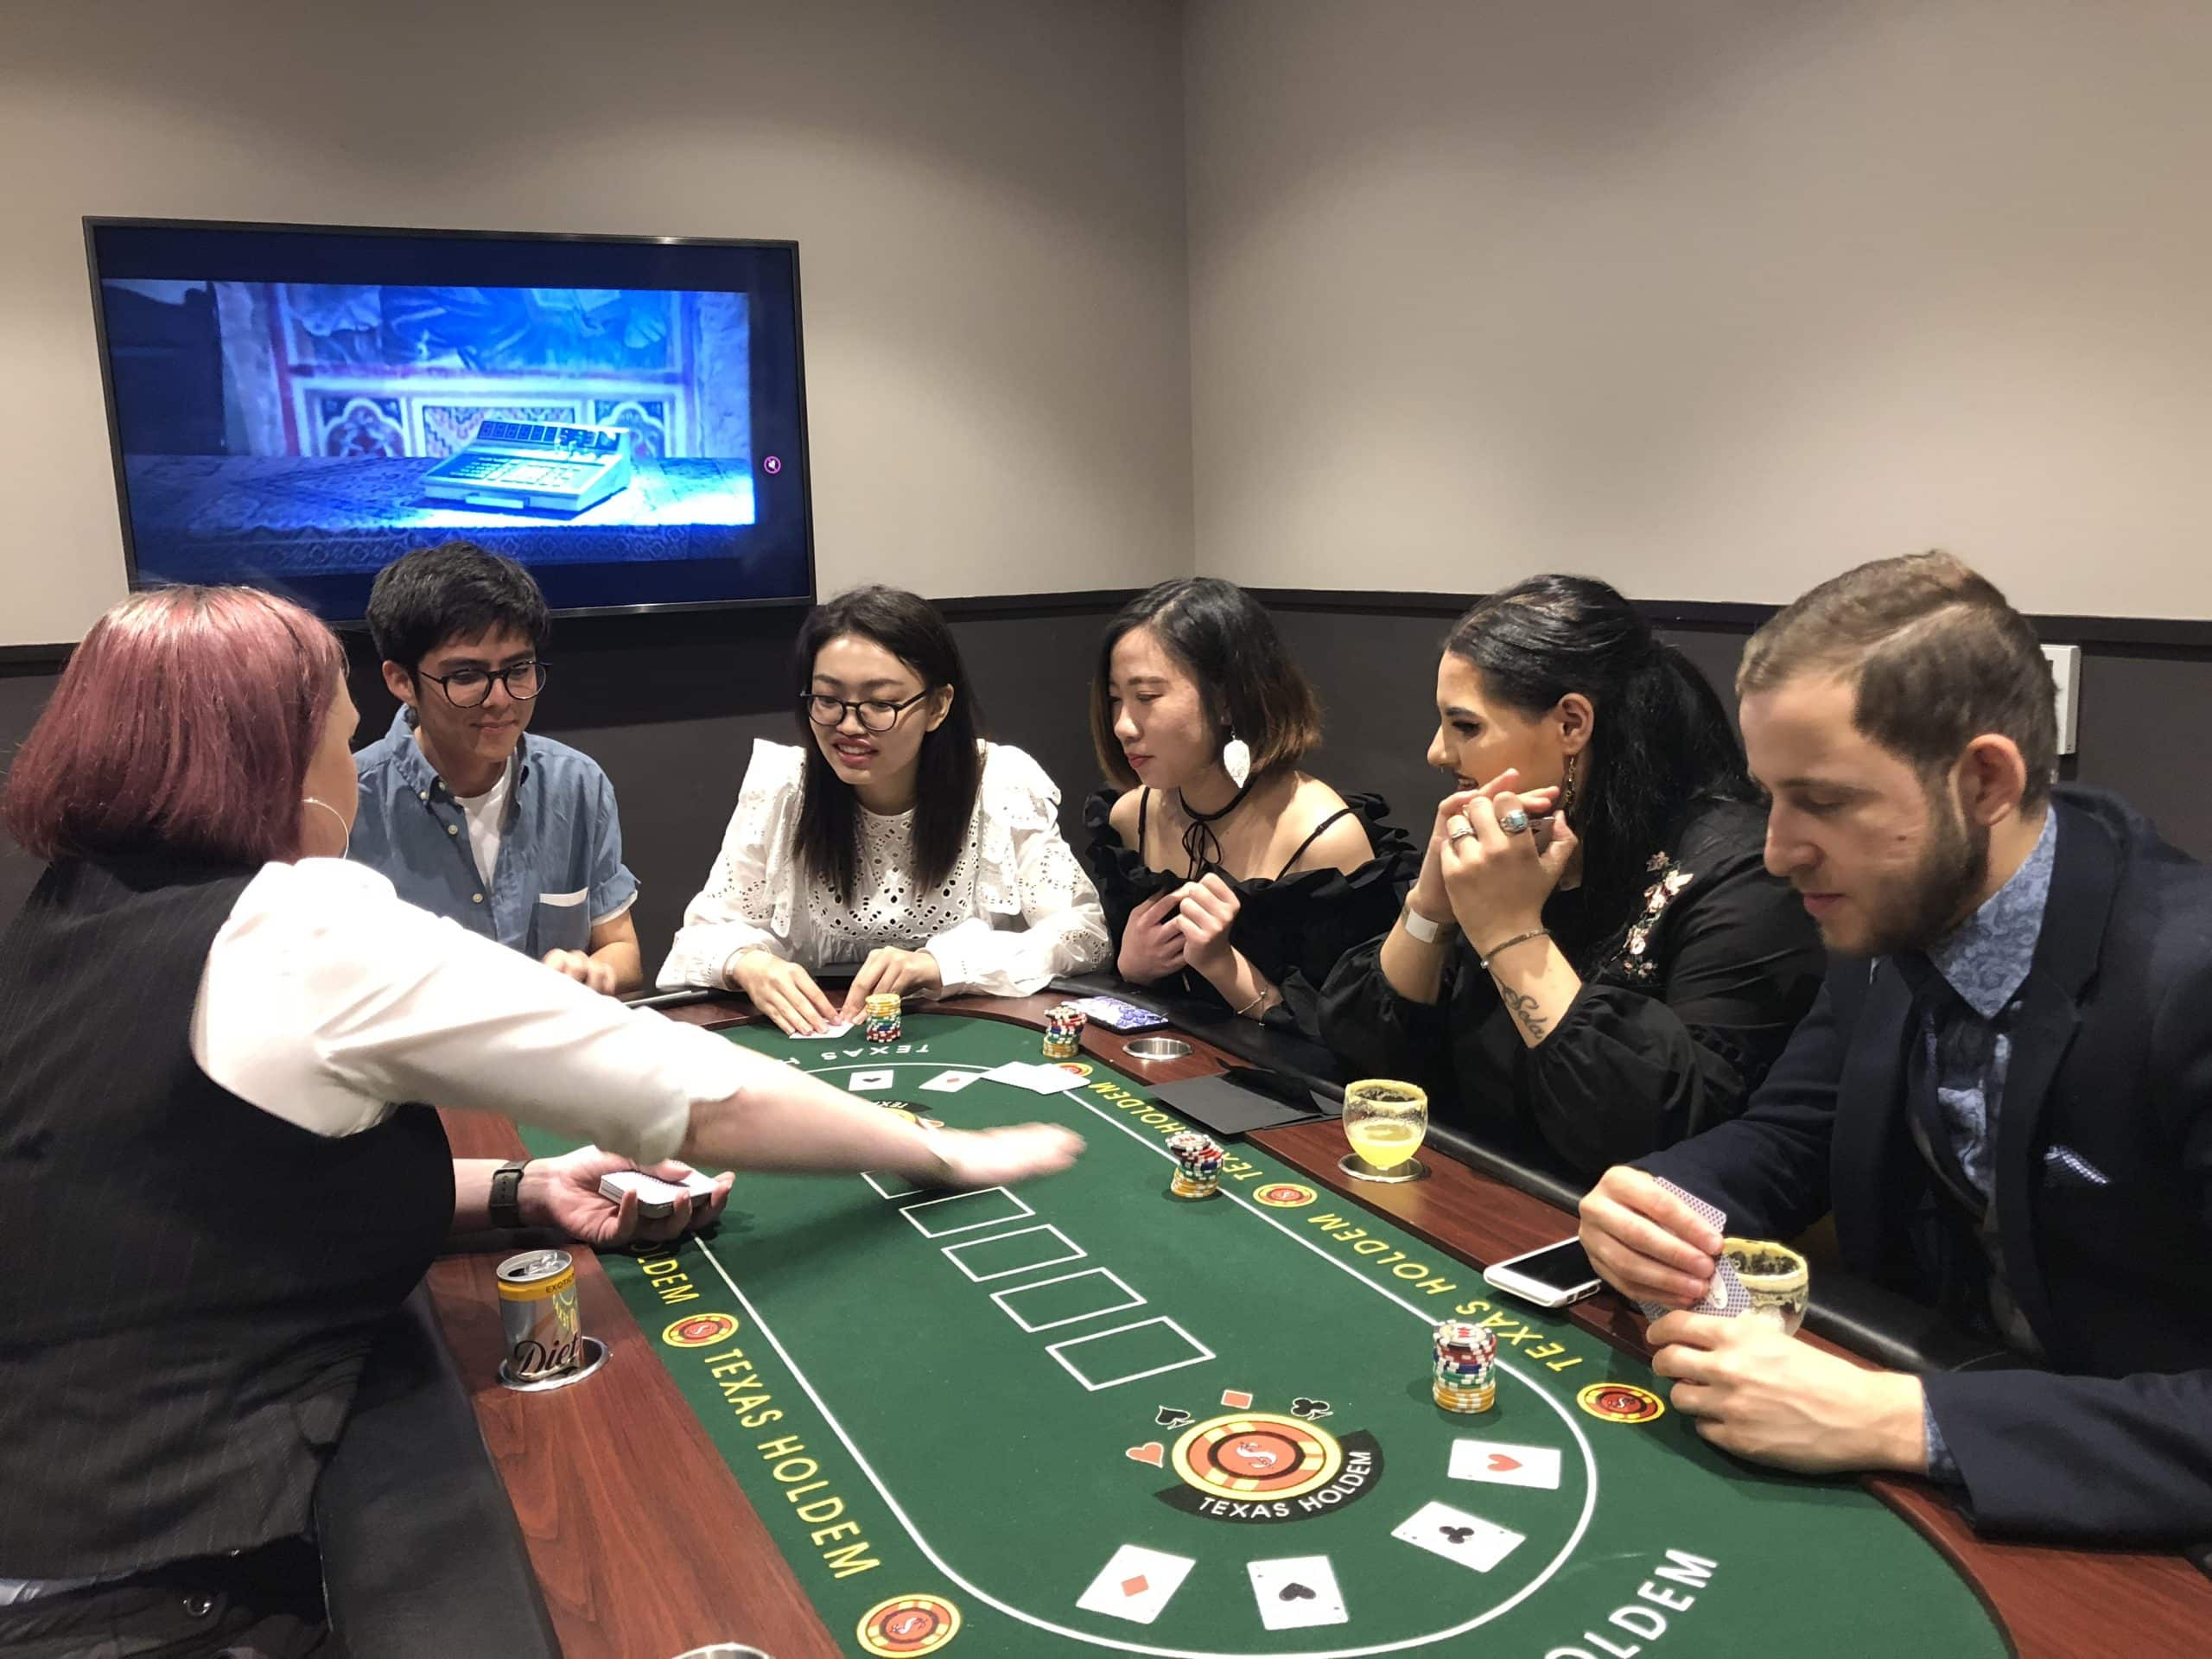 Poker Hire